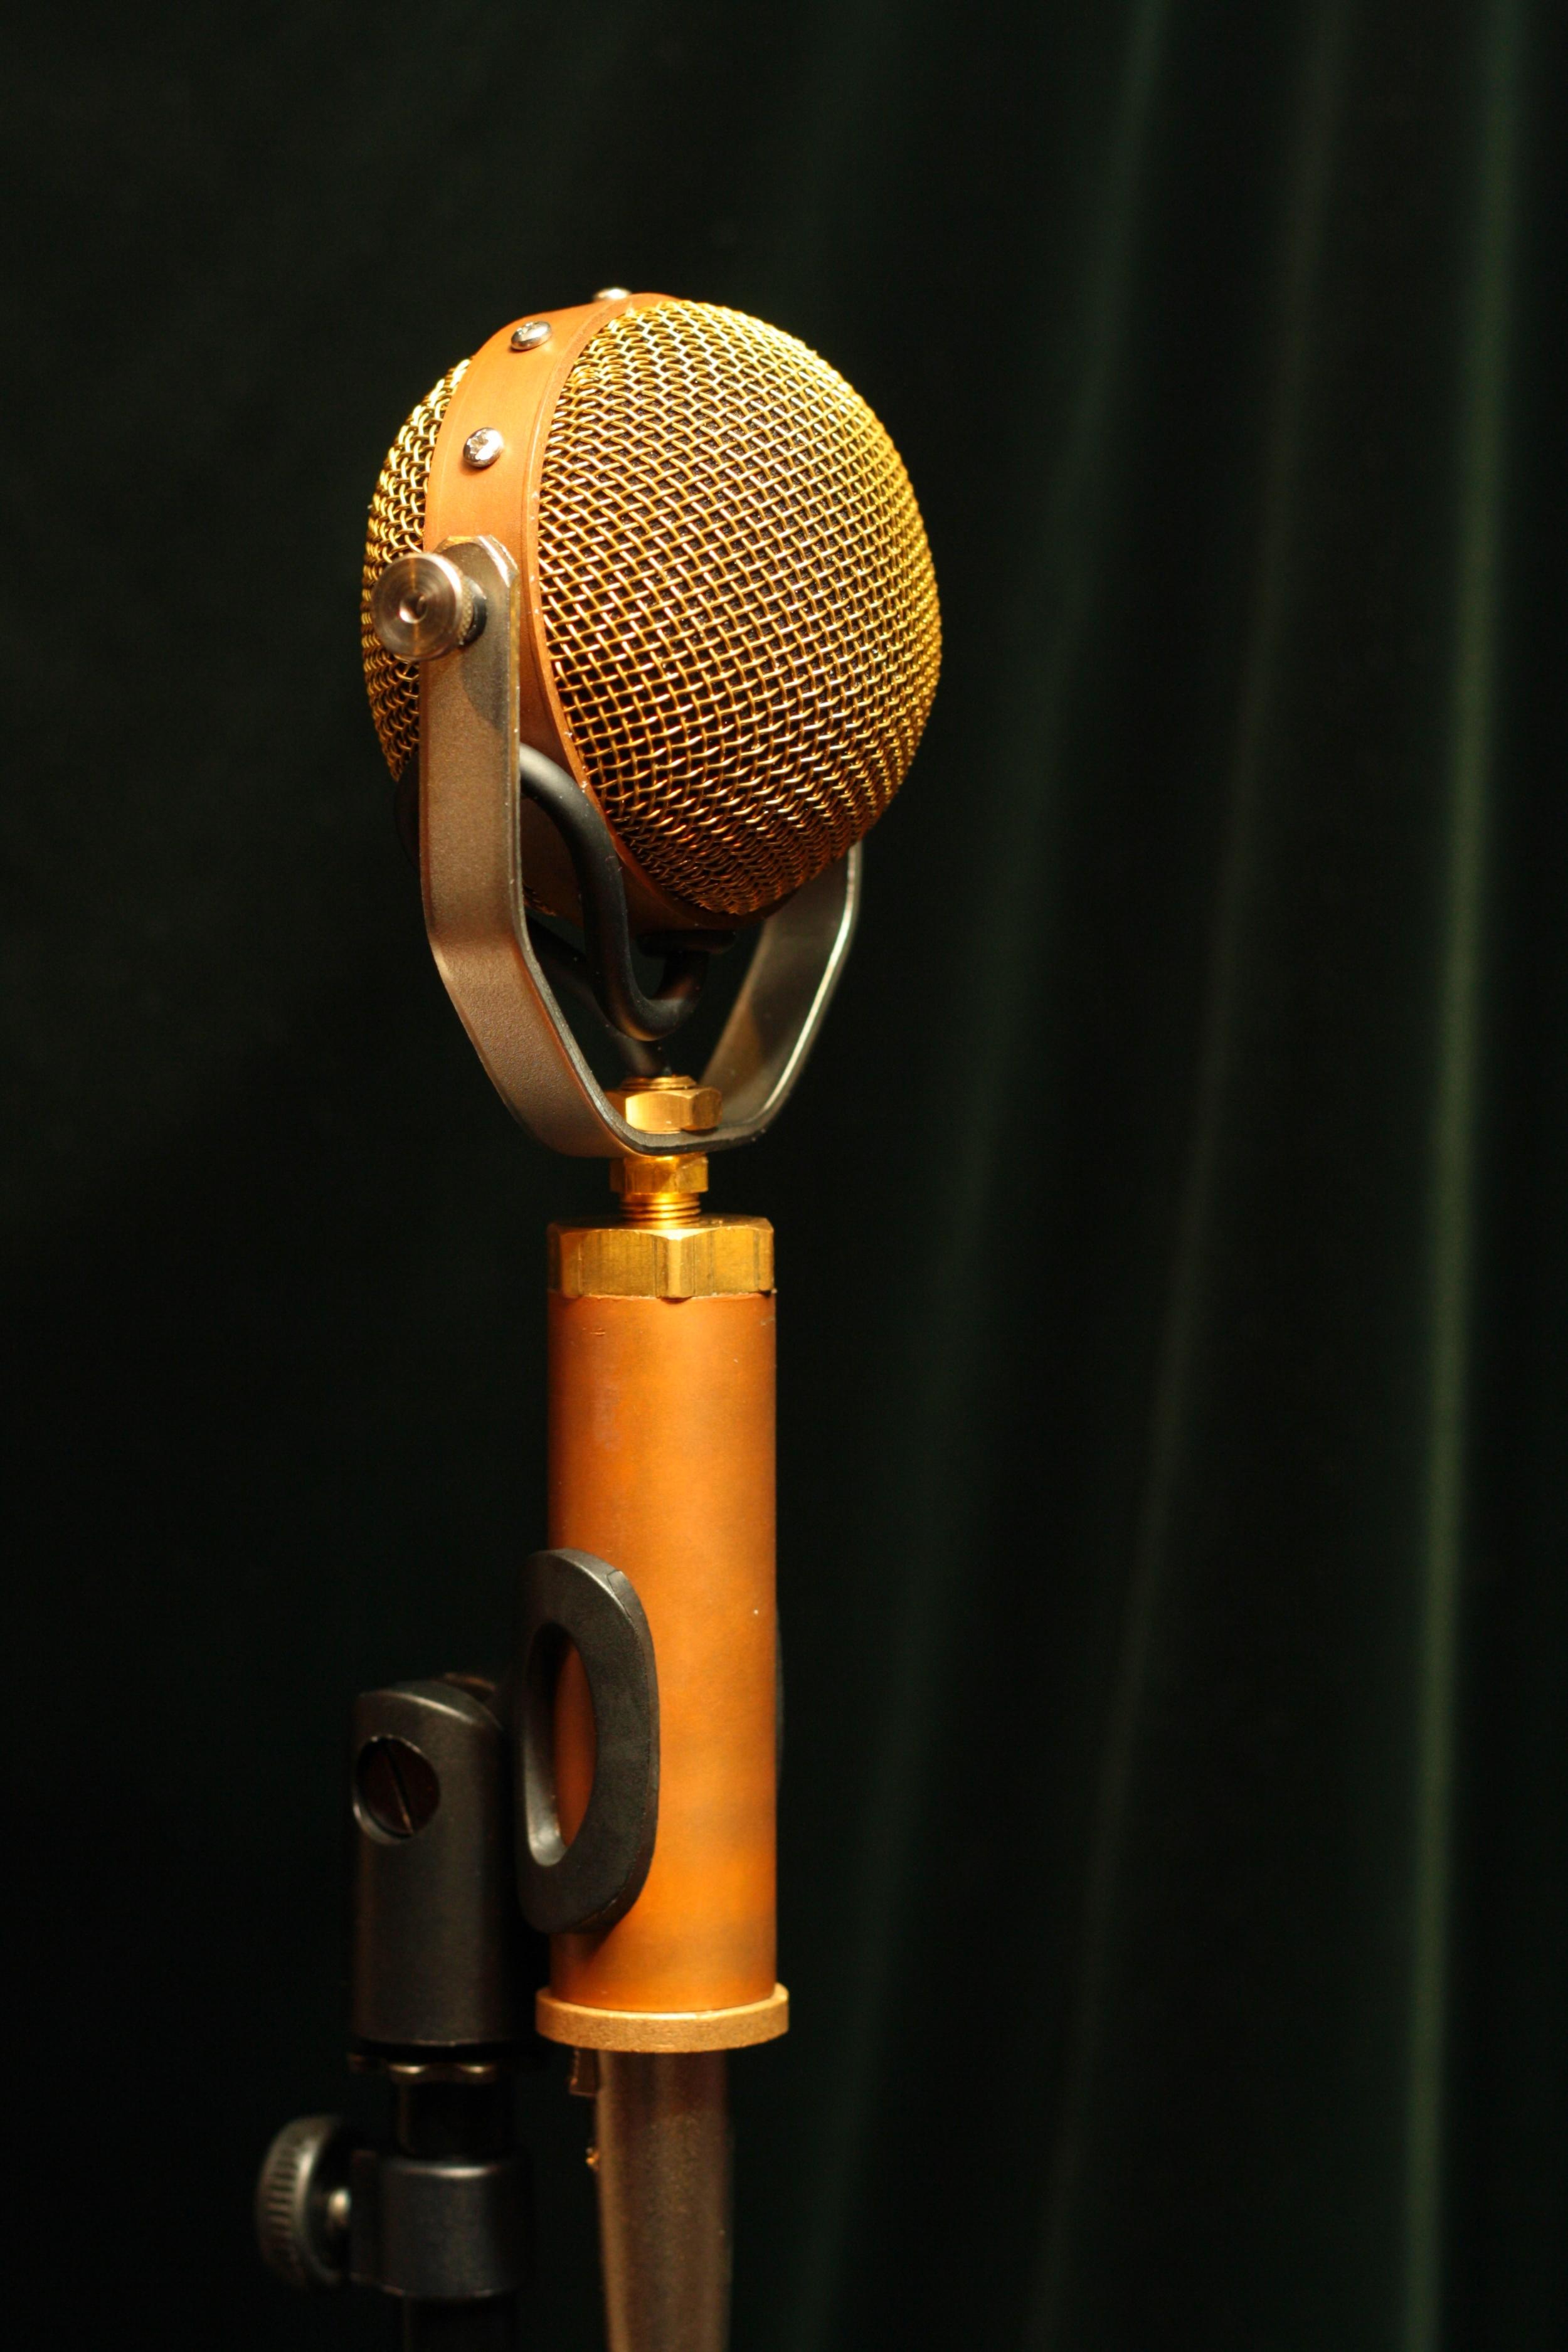 X-Y stereo mic (Decemberists'drum overhead)